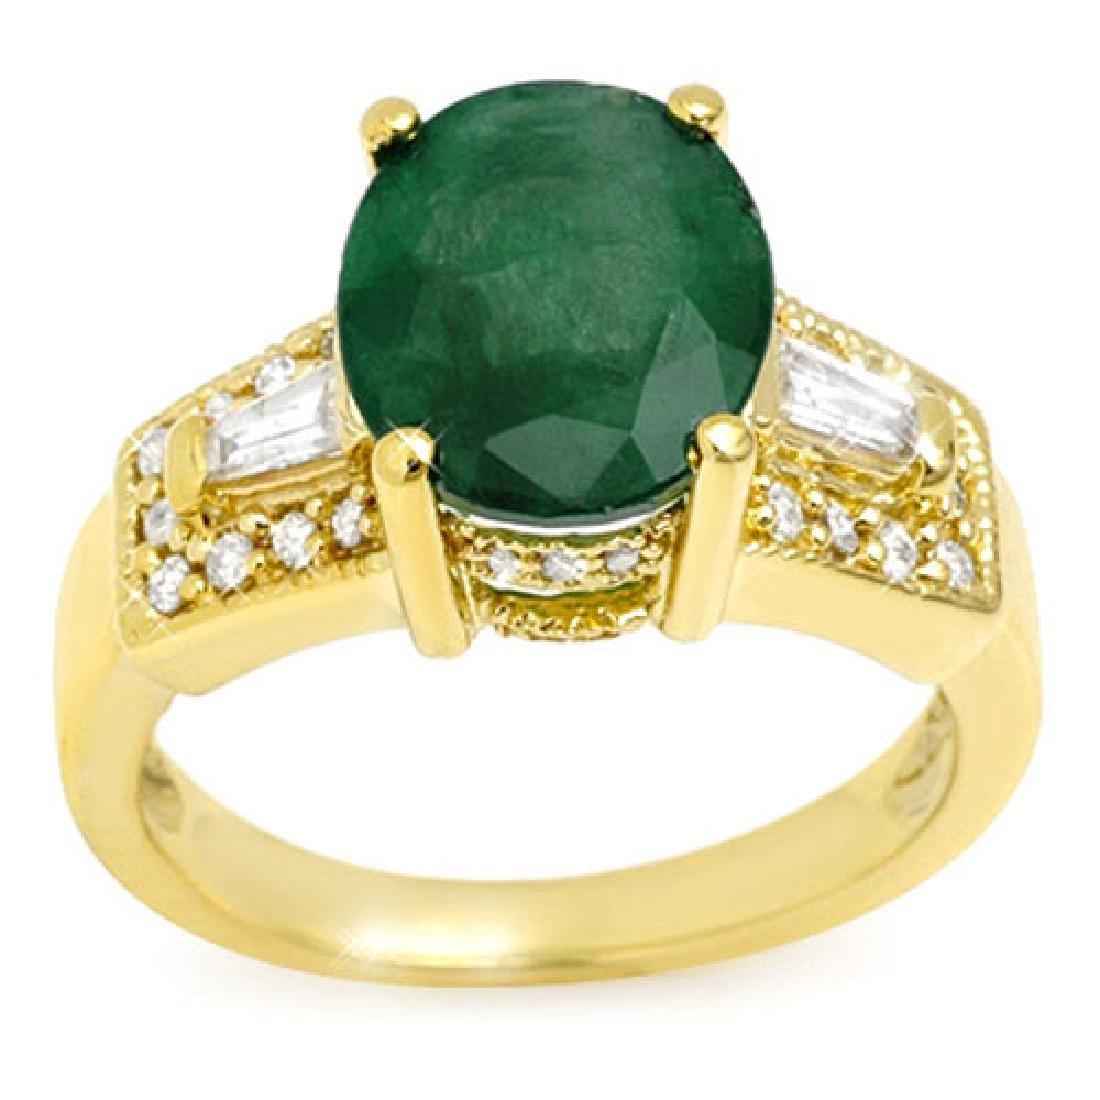 4.55 CTW Emerald & Diamond Ring 10K Yellow Gold